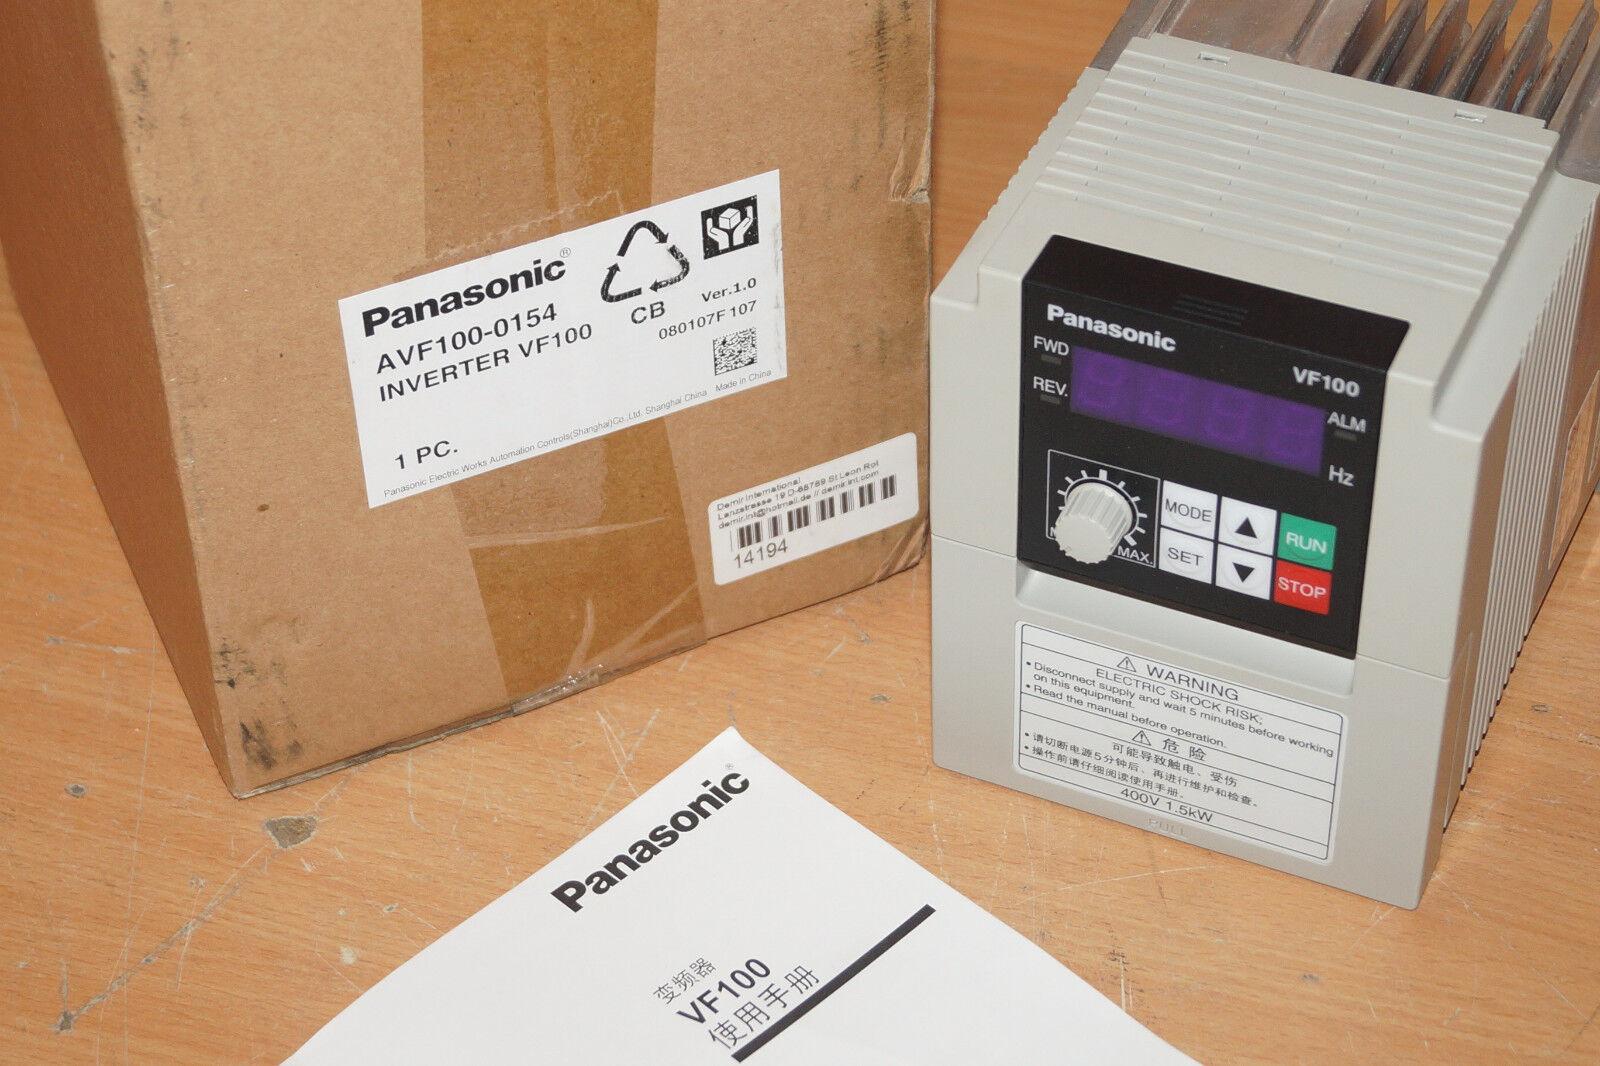 Panasonic vf200 manuals.